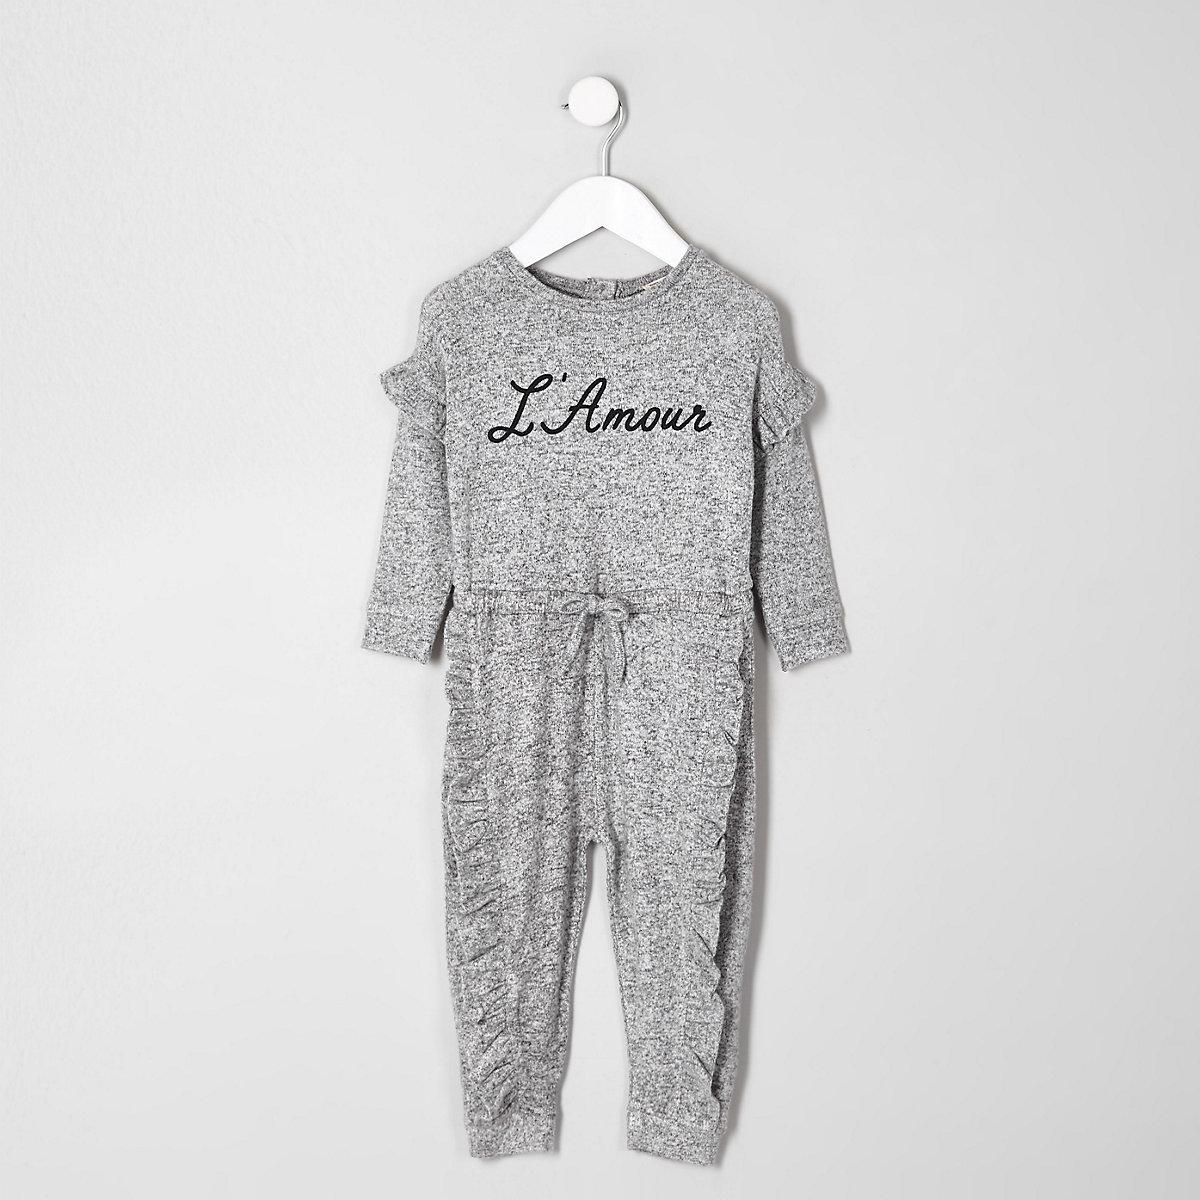 Mini girls grey 'L'amour' frill onesie